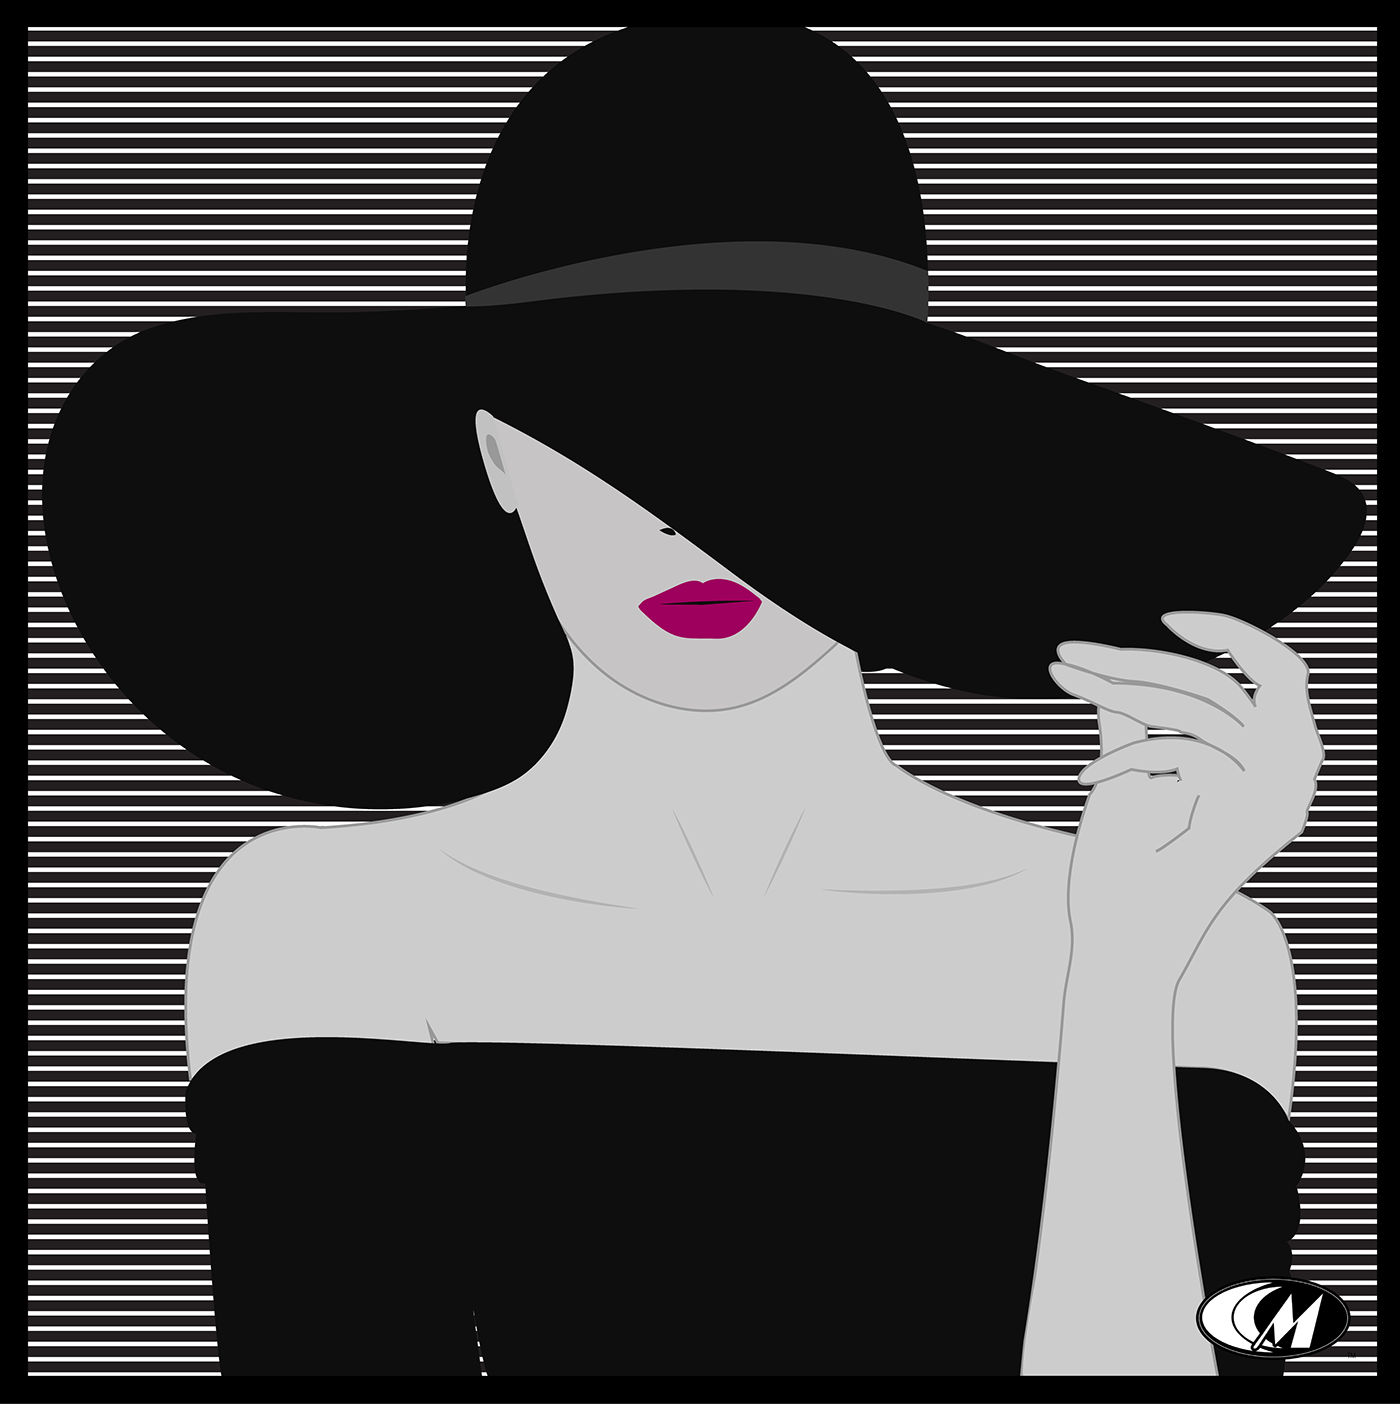 Fashion  ILLUSTRATION  Digital Art  floppy hat pink lips series vector minimalist